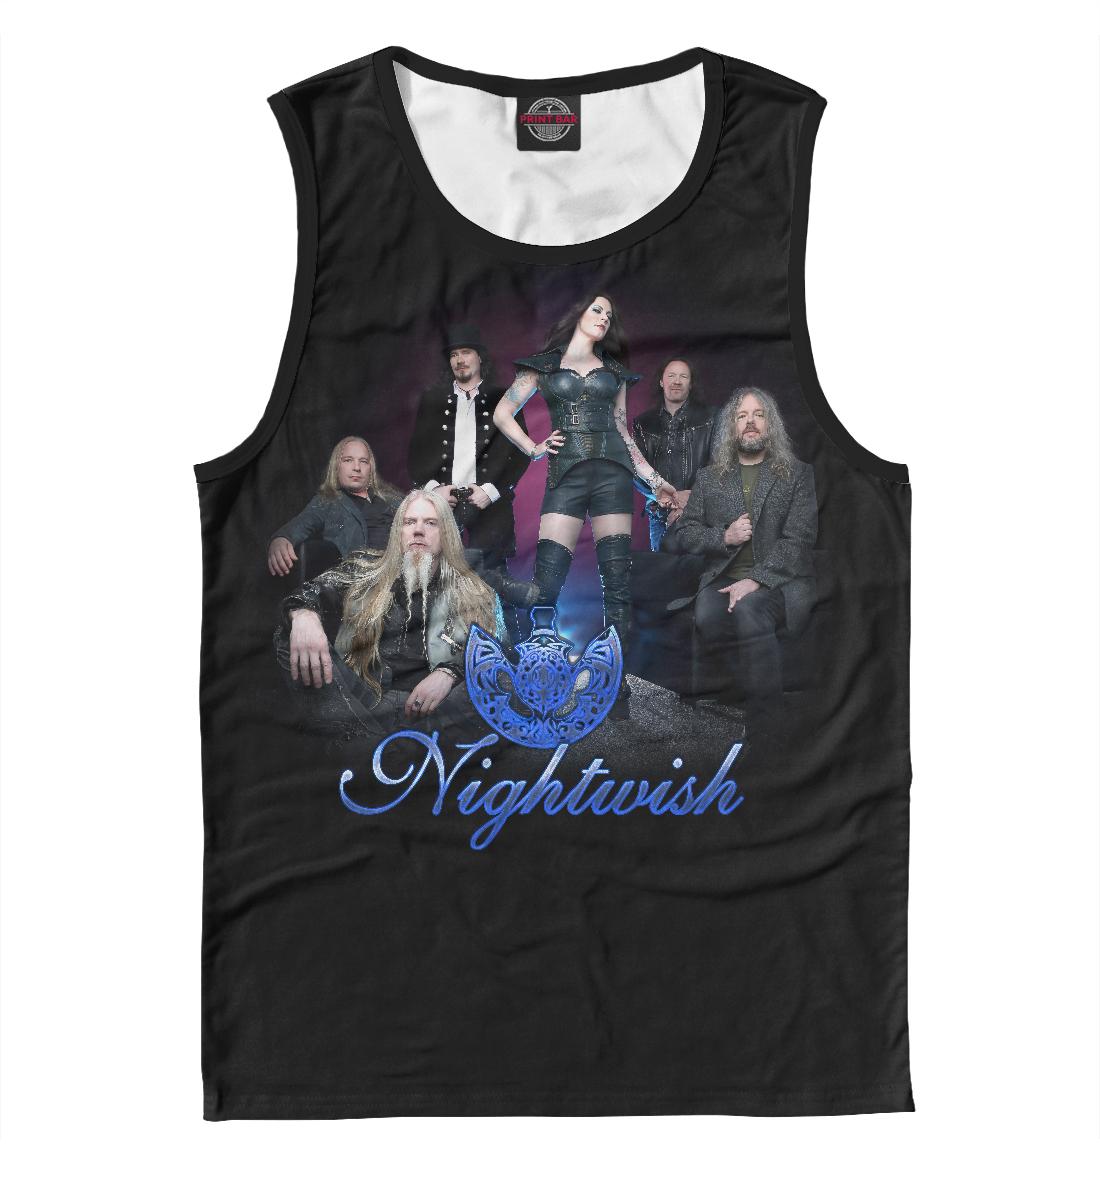 Купить Nightwish, Printbar, Майки, NTH-865150-may-2